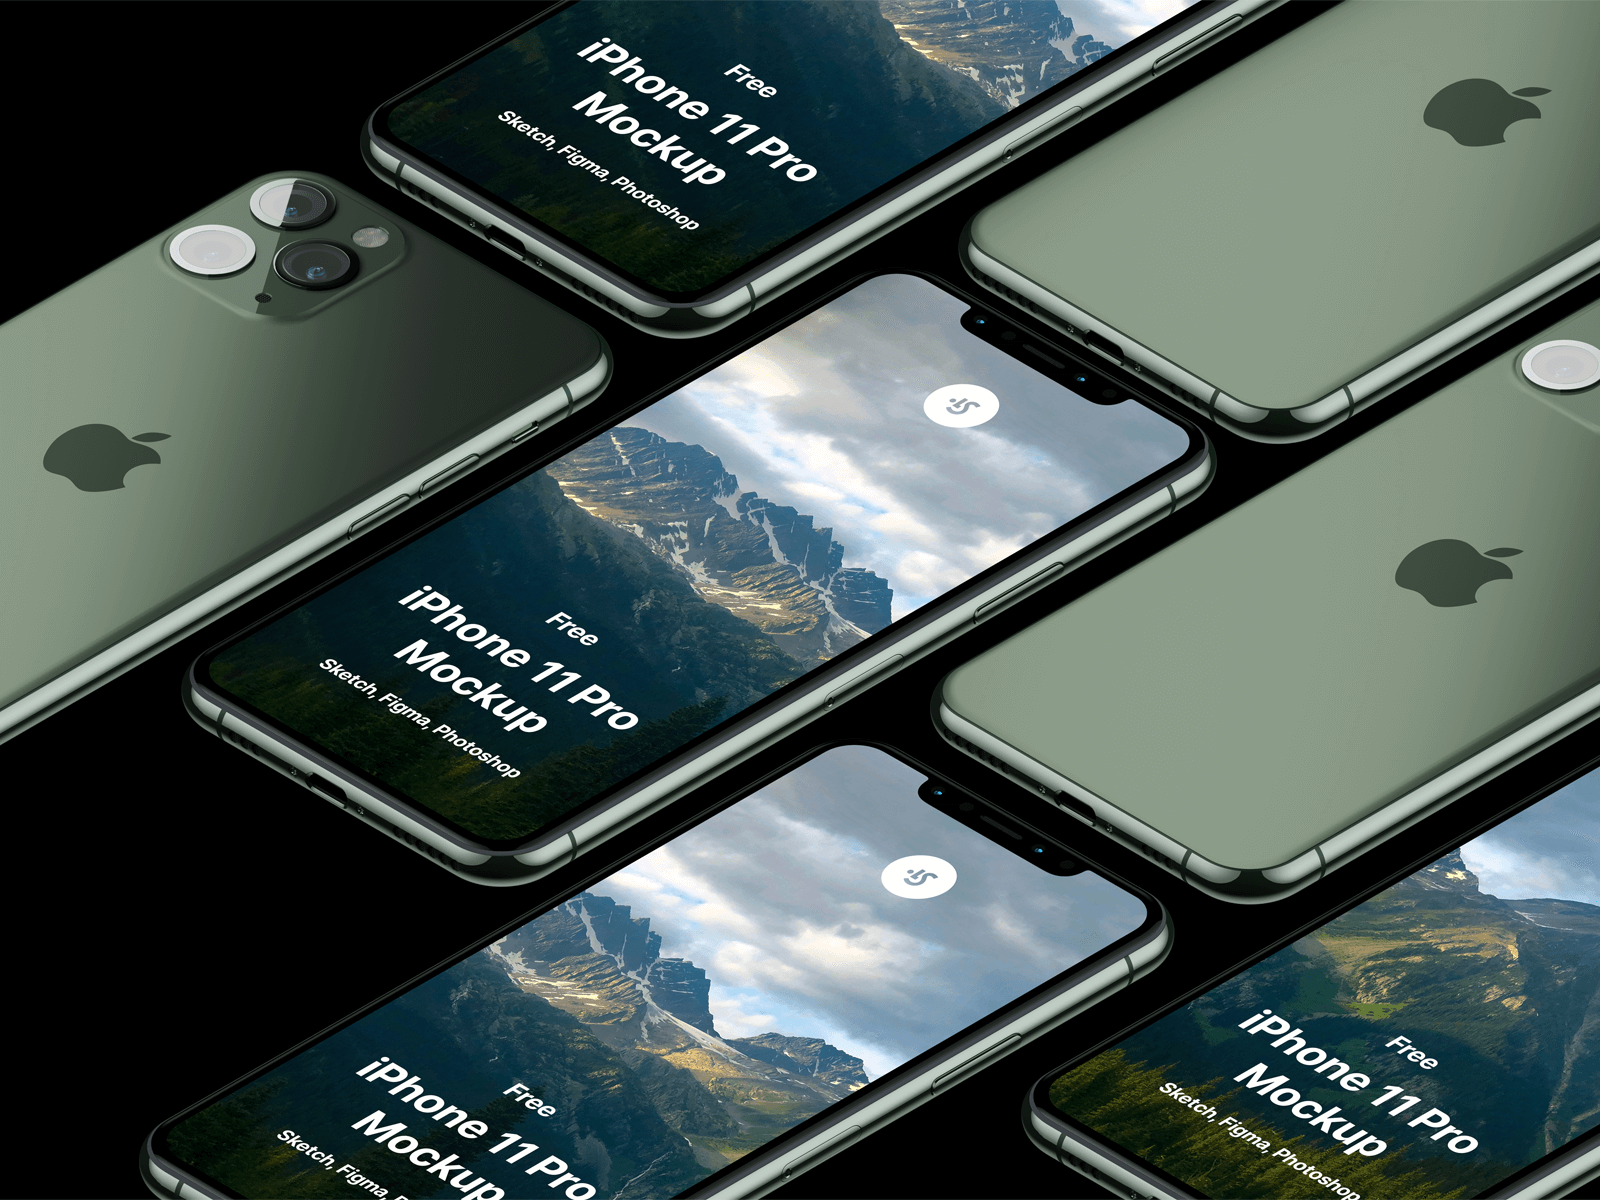 Midnight green iPhone 11 Pros